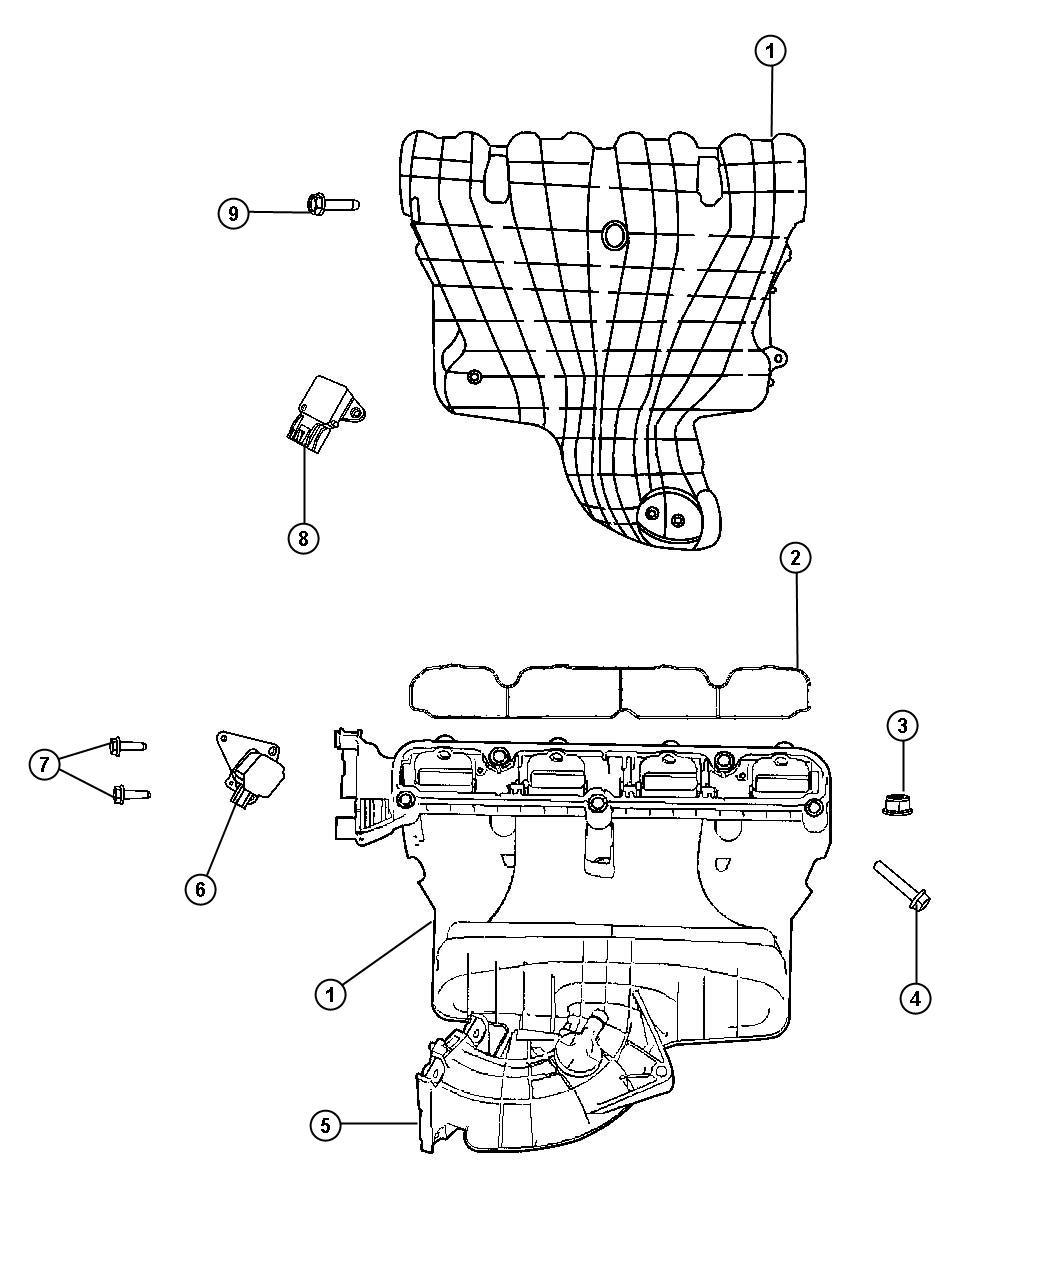 Dodge Caliber Actuator. Flow control valve. With [5-speed